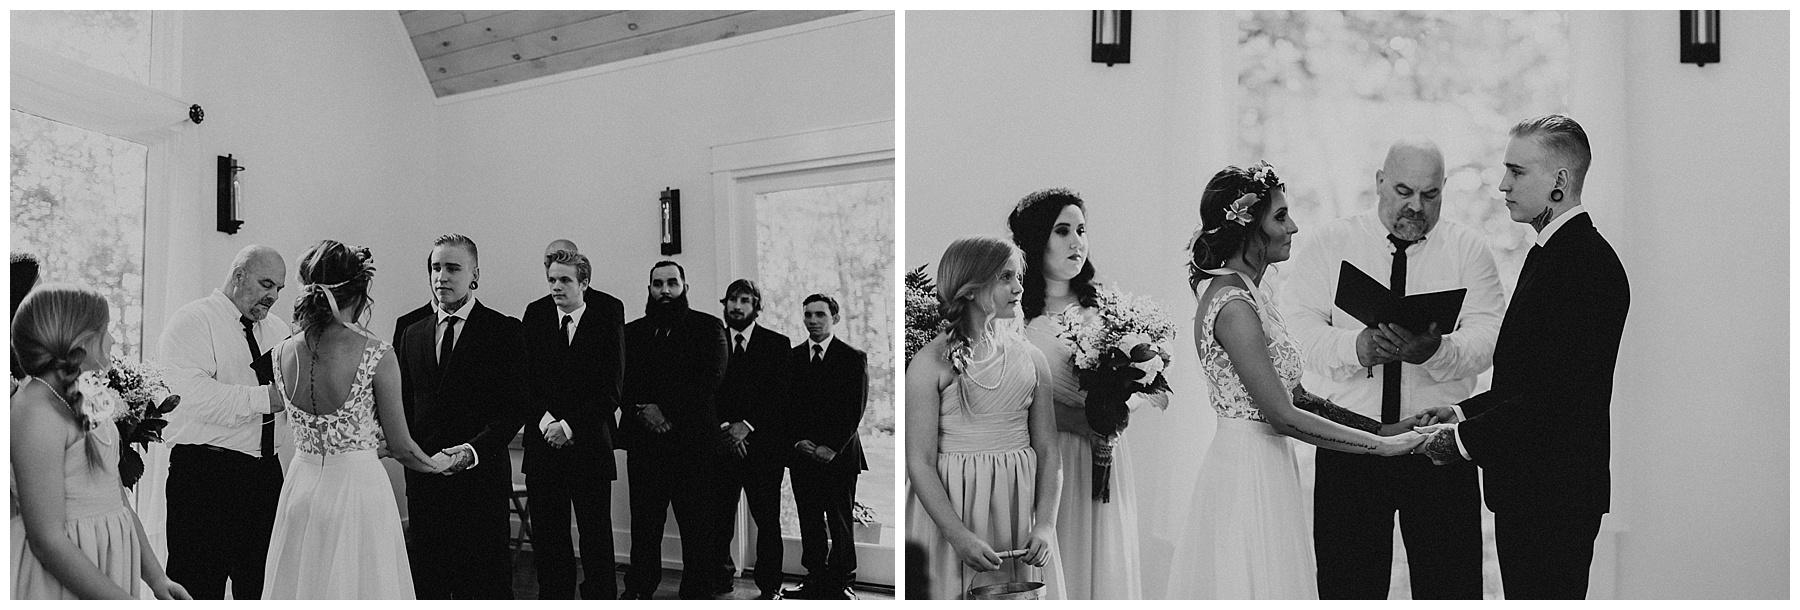 Georgia Wedding Tampa Wedding Photographer-71.jpg